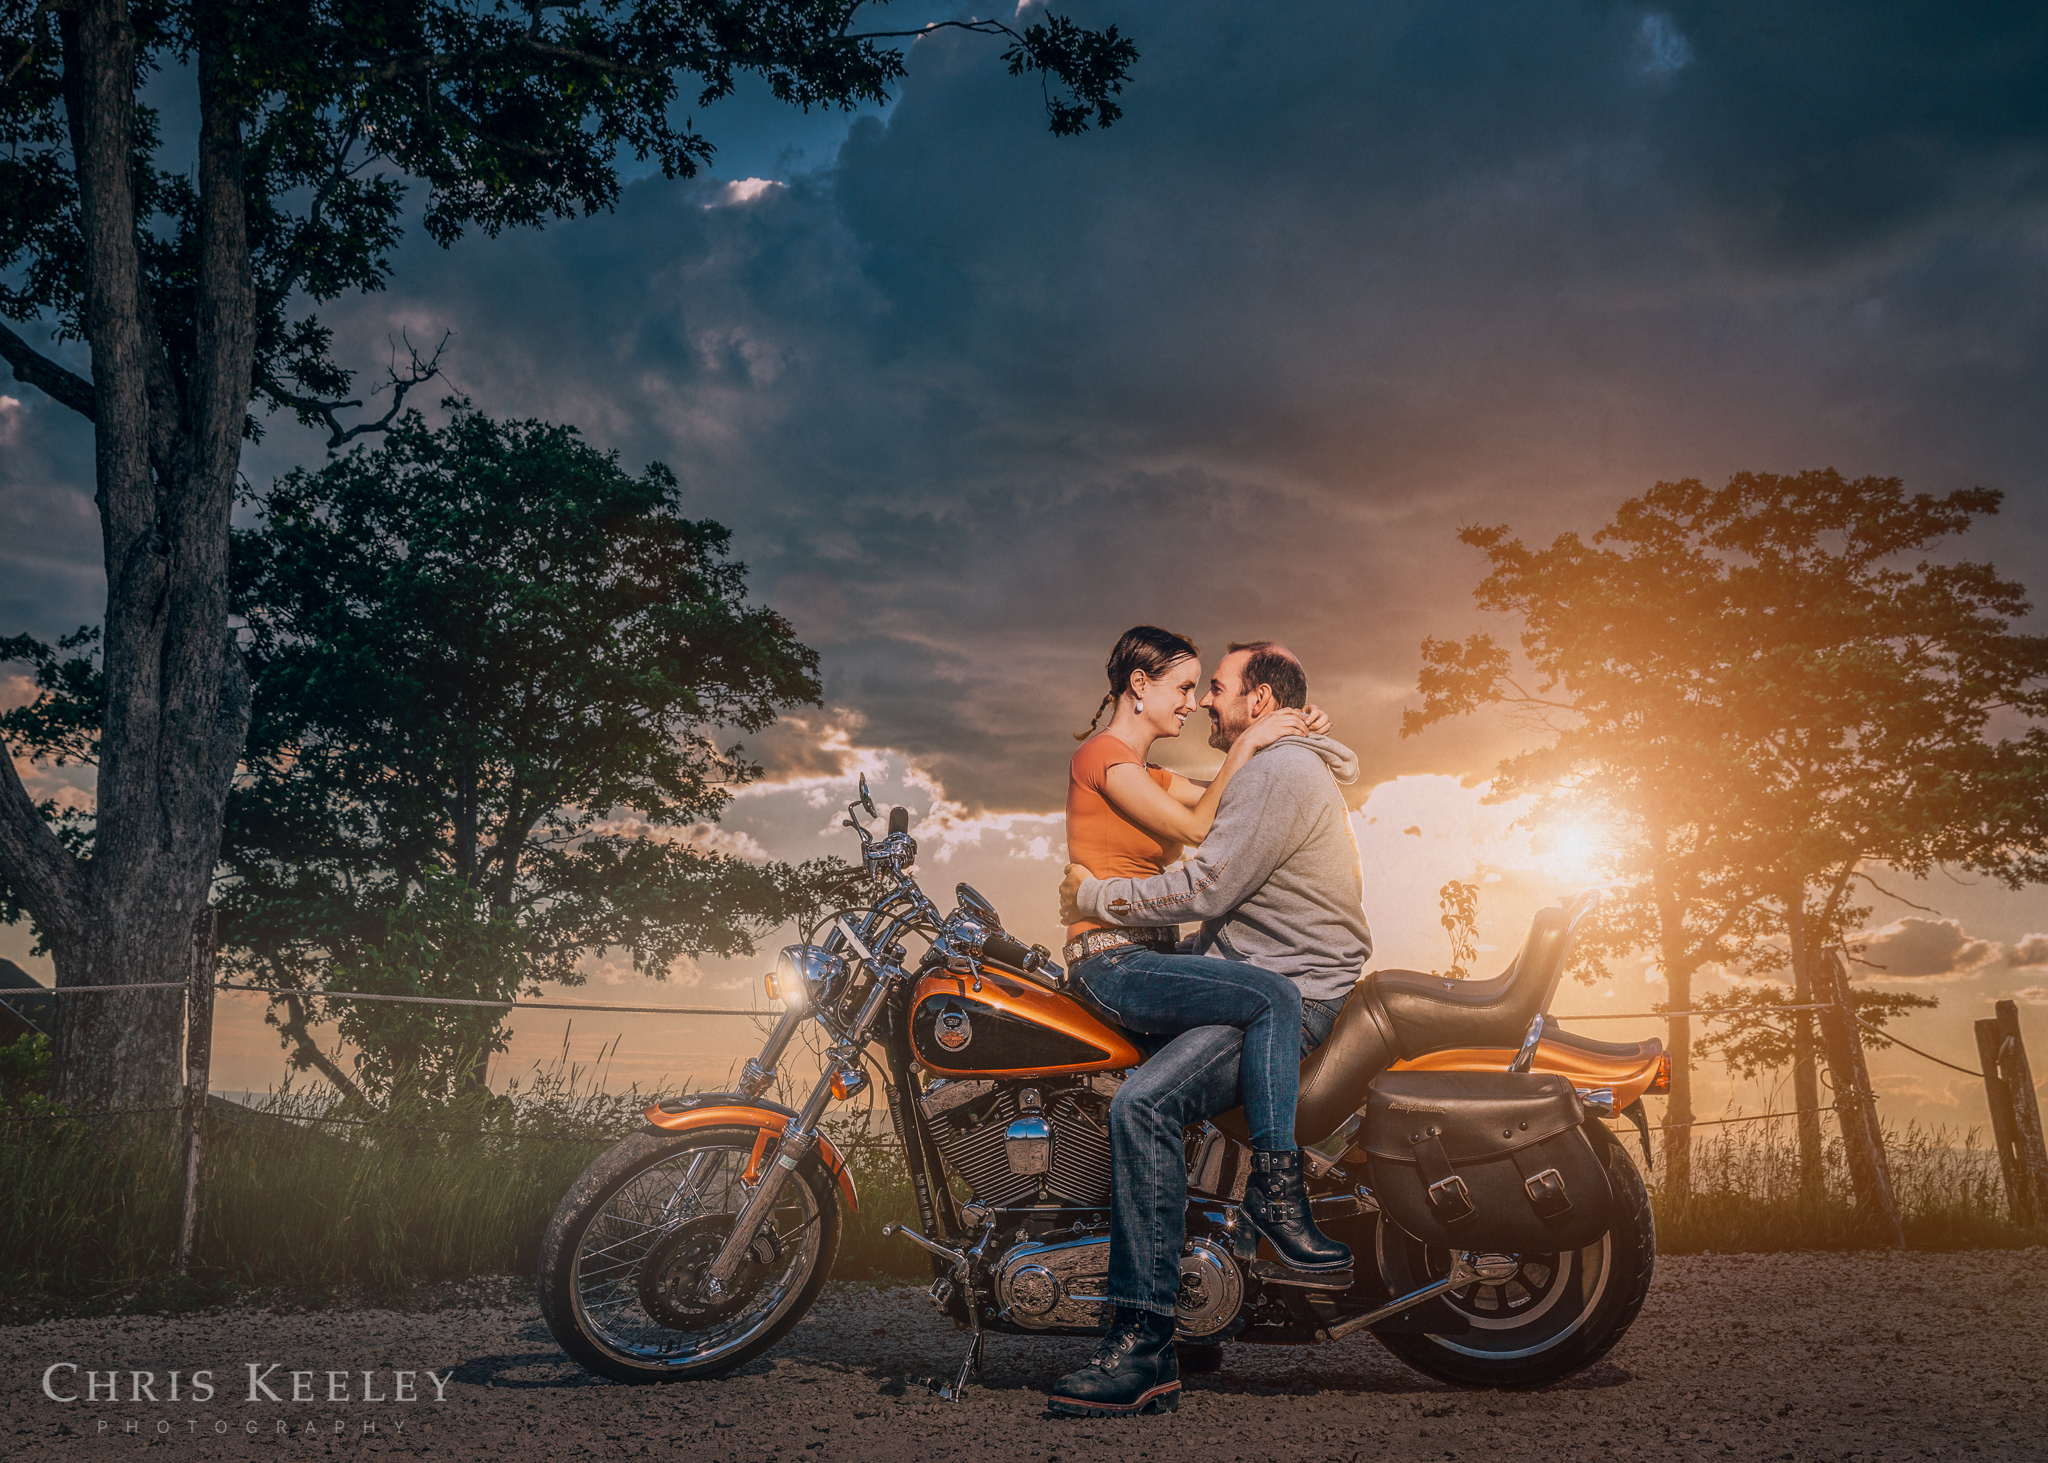 dover-new-hampshire-wedding-photographer-chris-keeley-photography-motorcycle-04.jpg